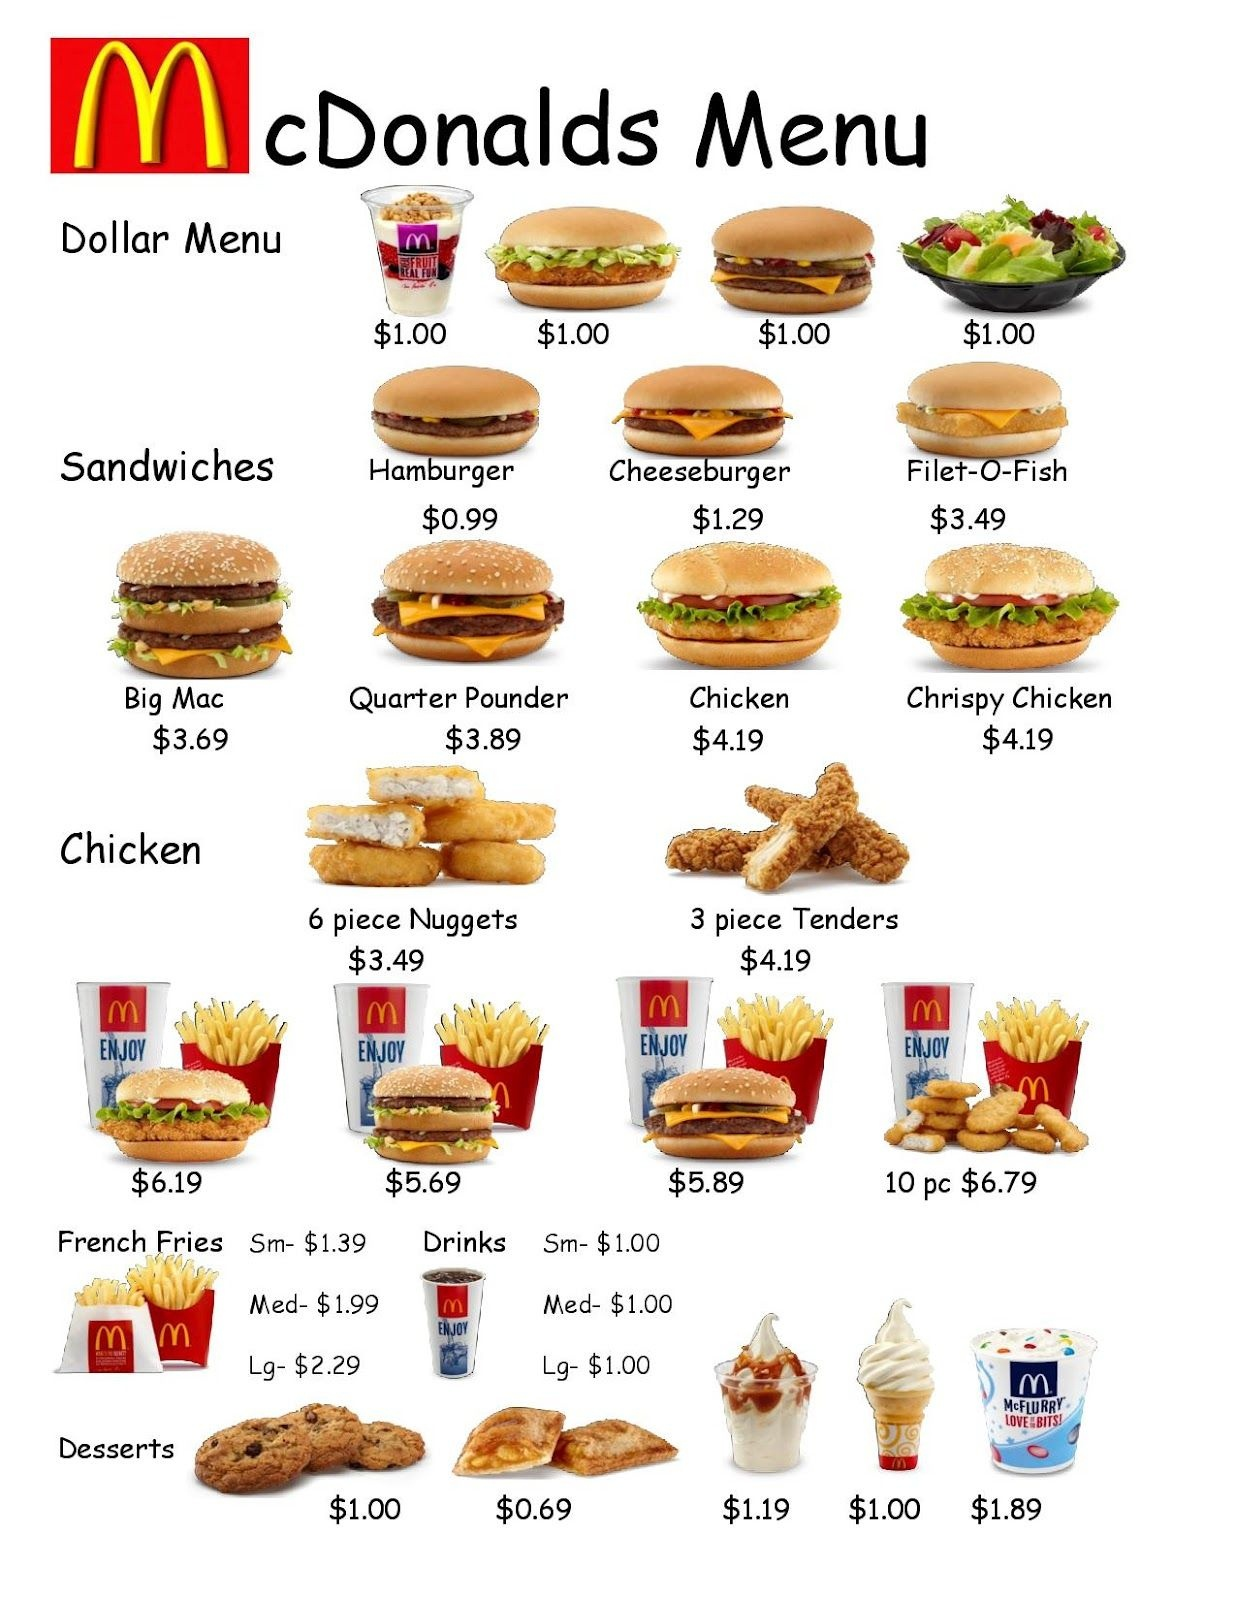 Empoweredthem: Fast Food Worksheet 1   Learning Life Skills - Free Printable Menu Math Worksheets